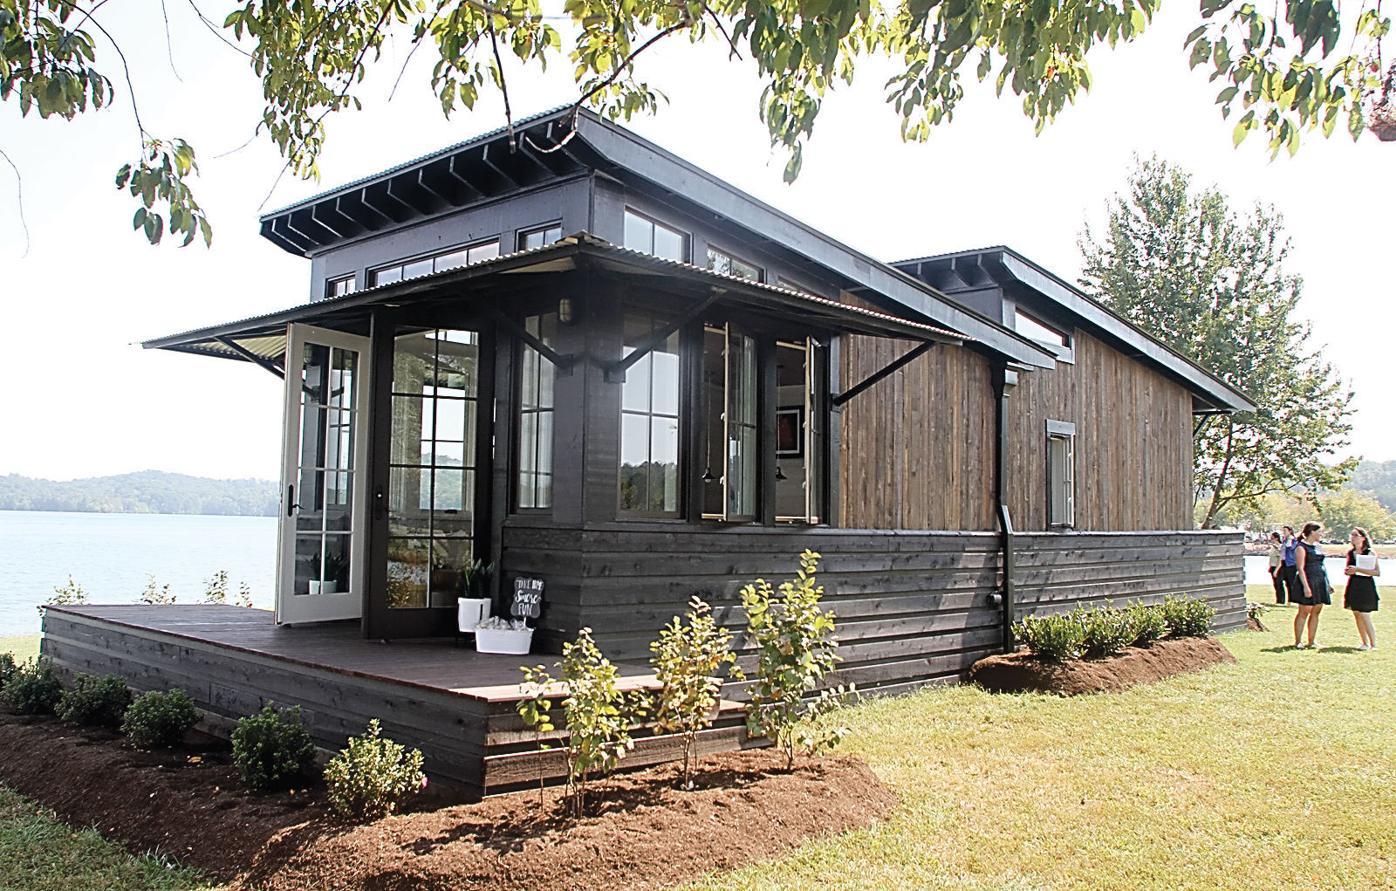 Clayton Unveils Second Tiny Home Design Business Thedailytimes Com